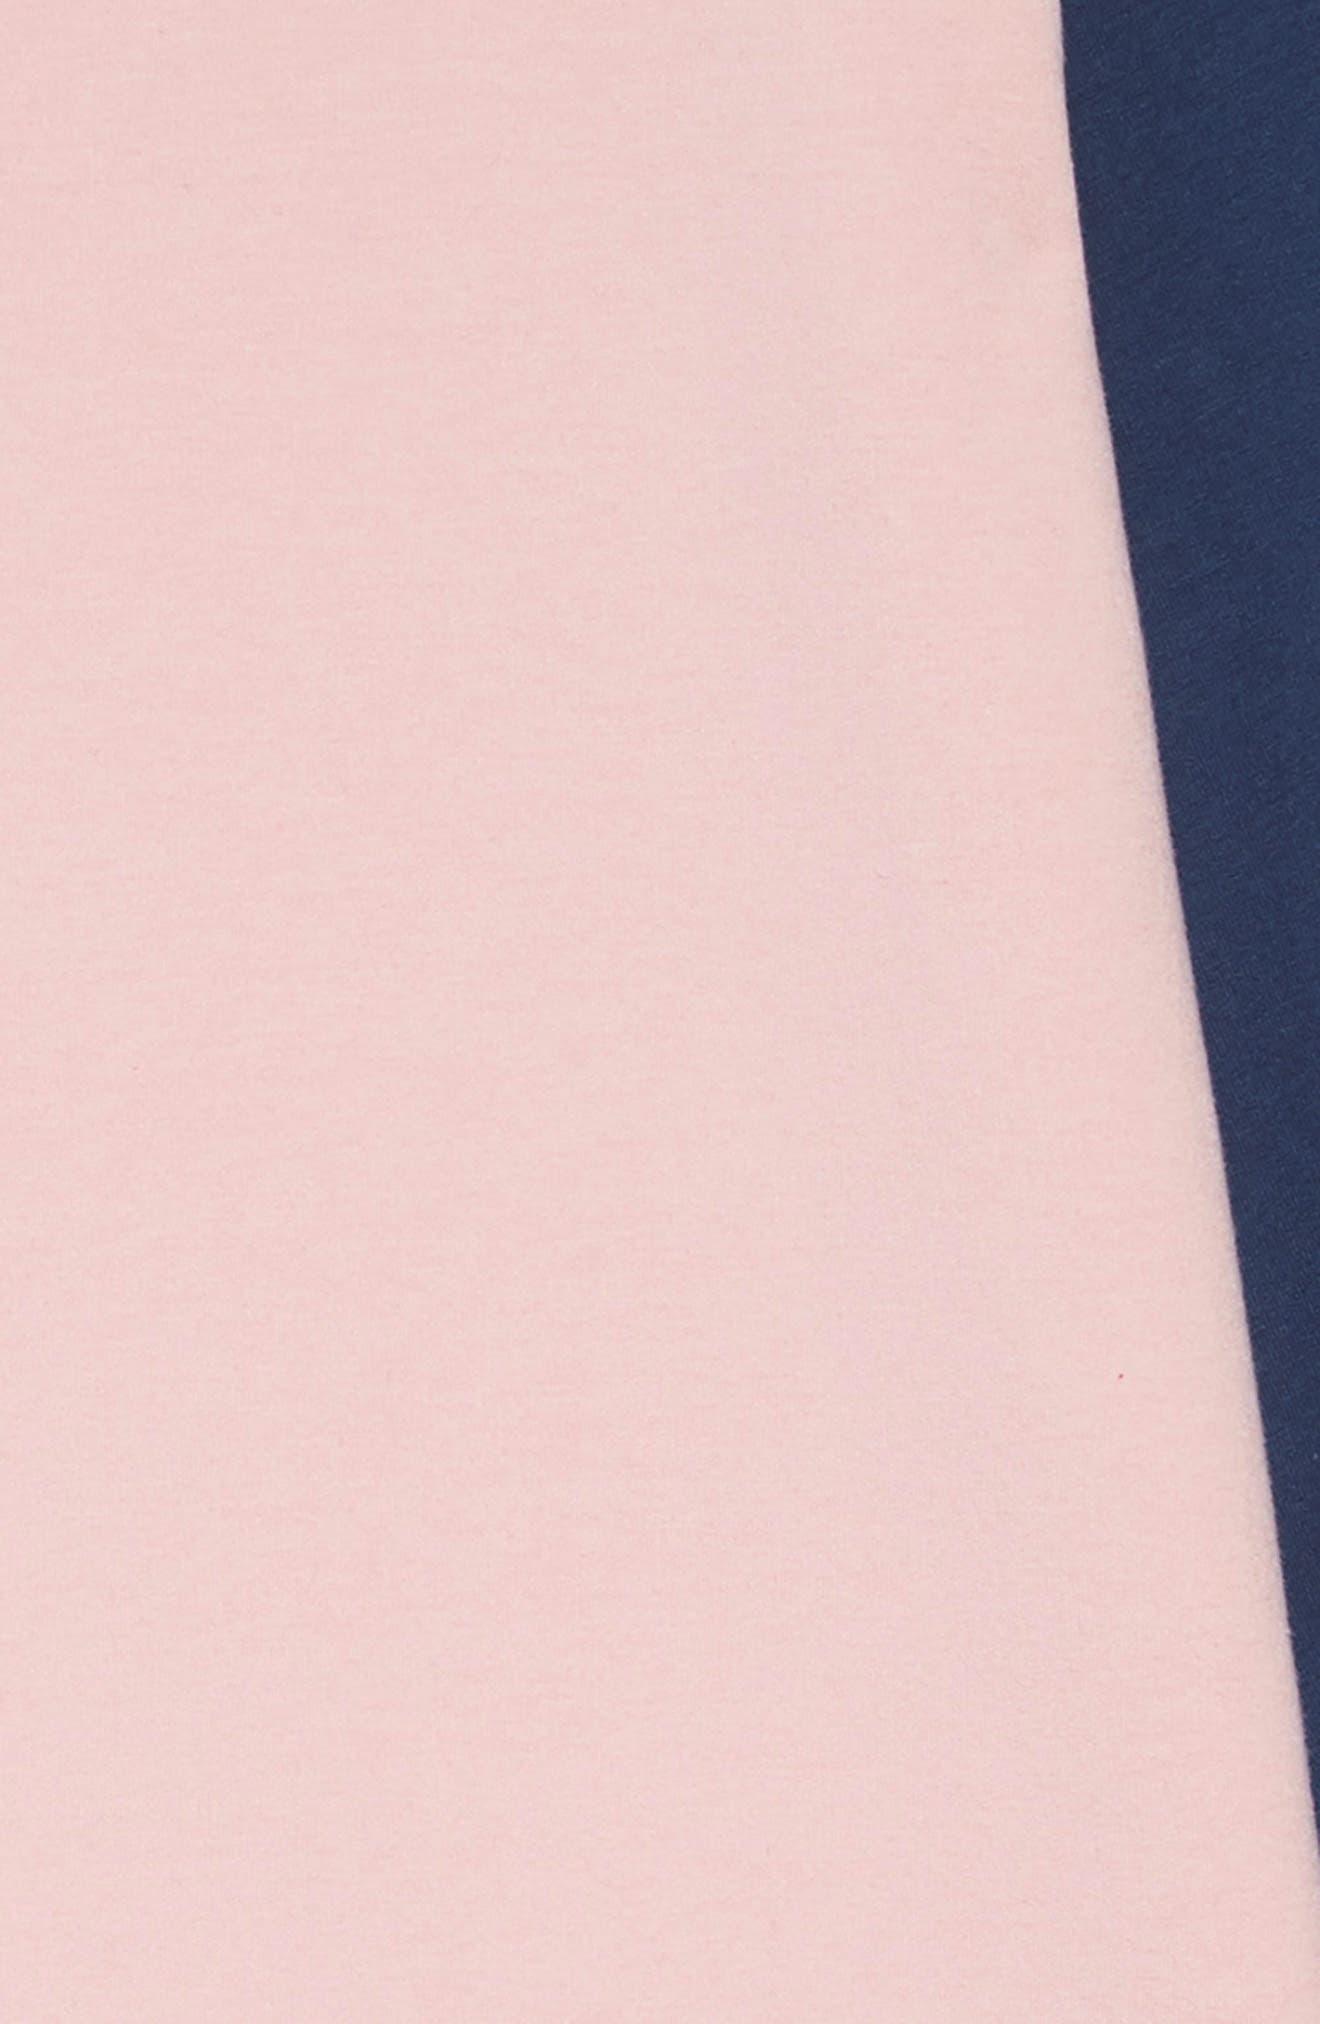 TUCKER + TATE, Colorblock Fleece Dress, Alternate thumbnail 3, color, 680